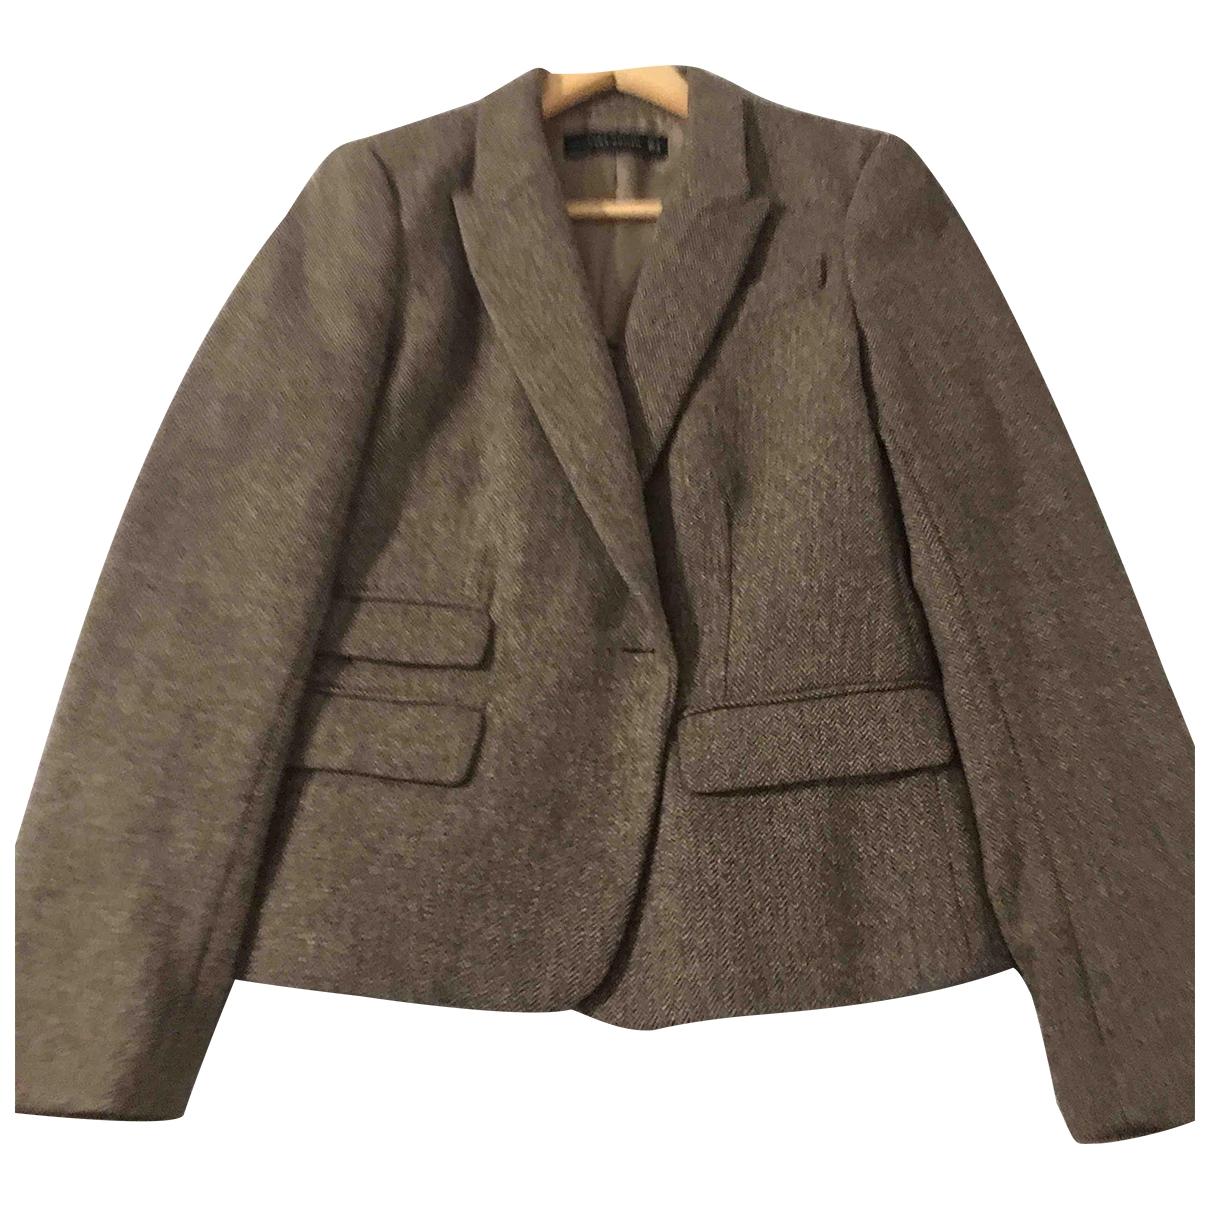 Zara \N Brown Wool jacket for Women M International